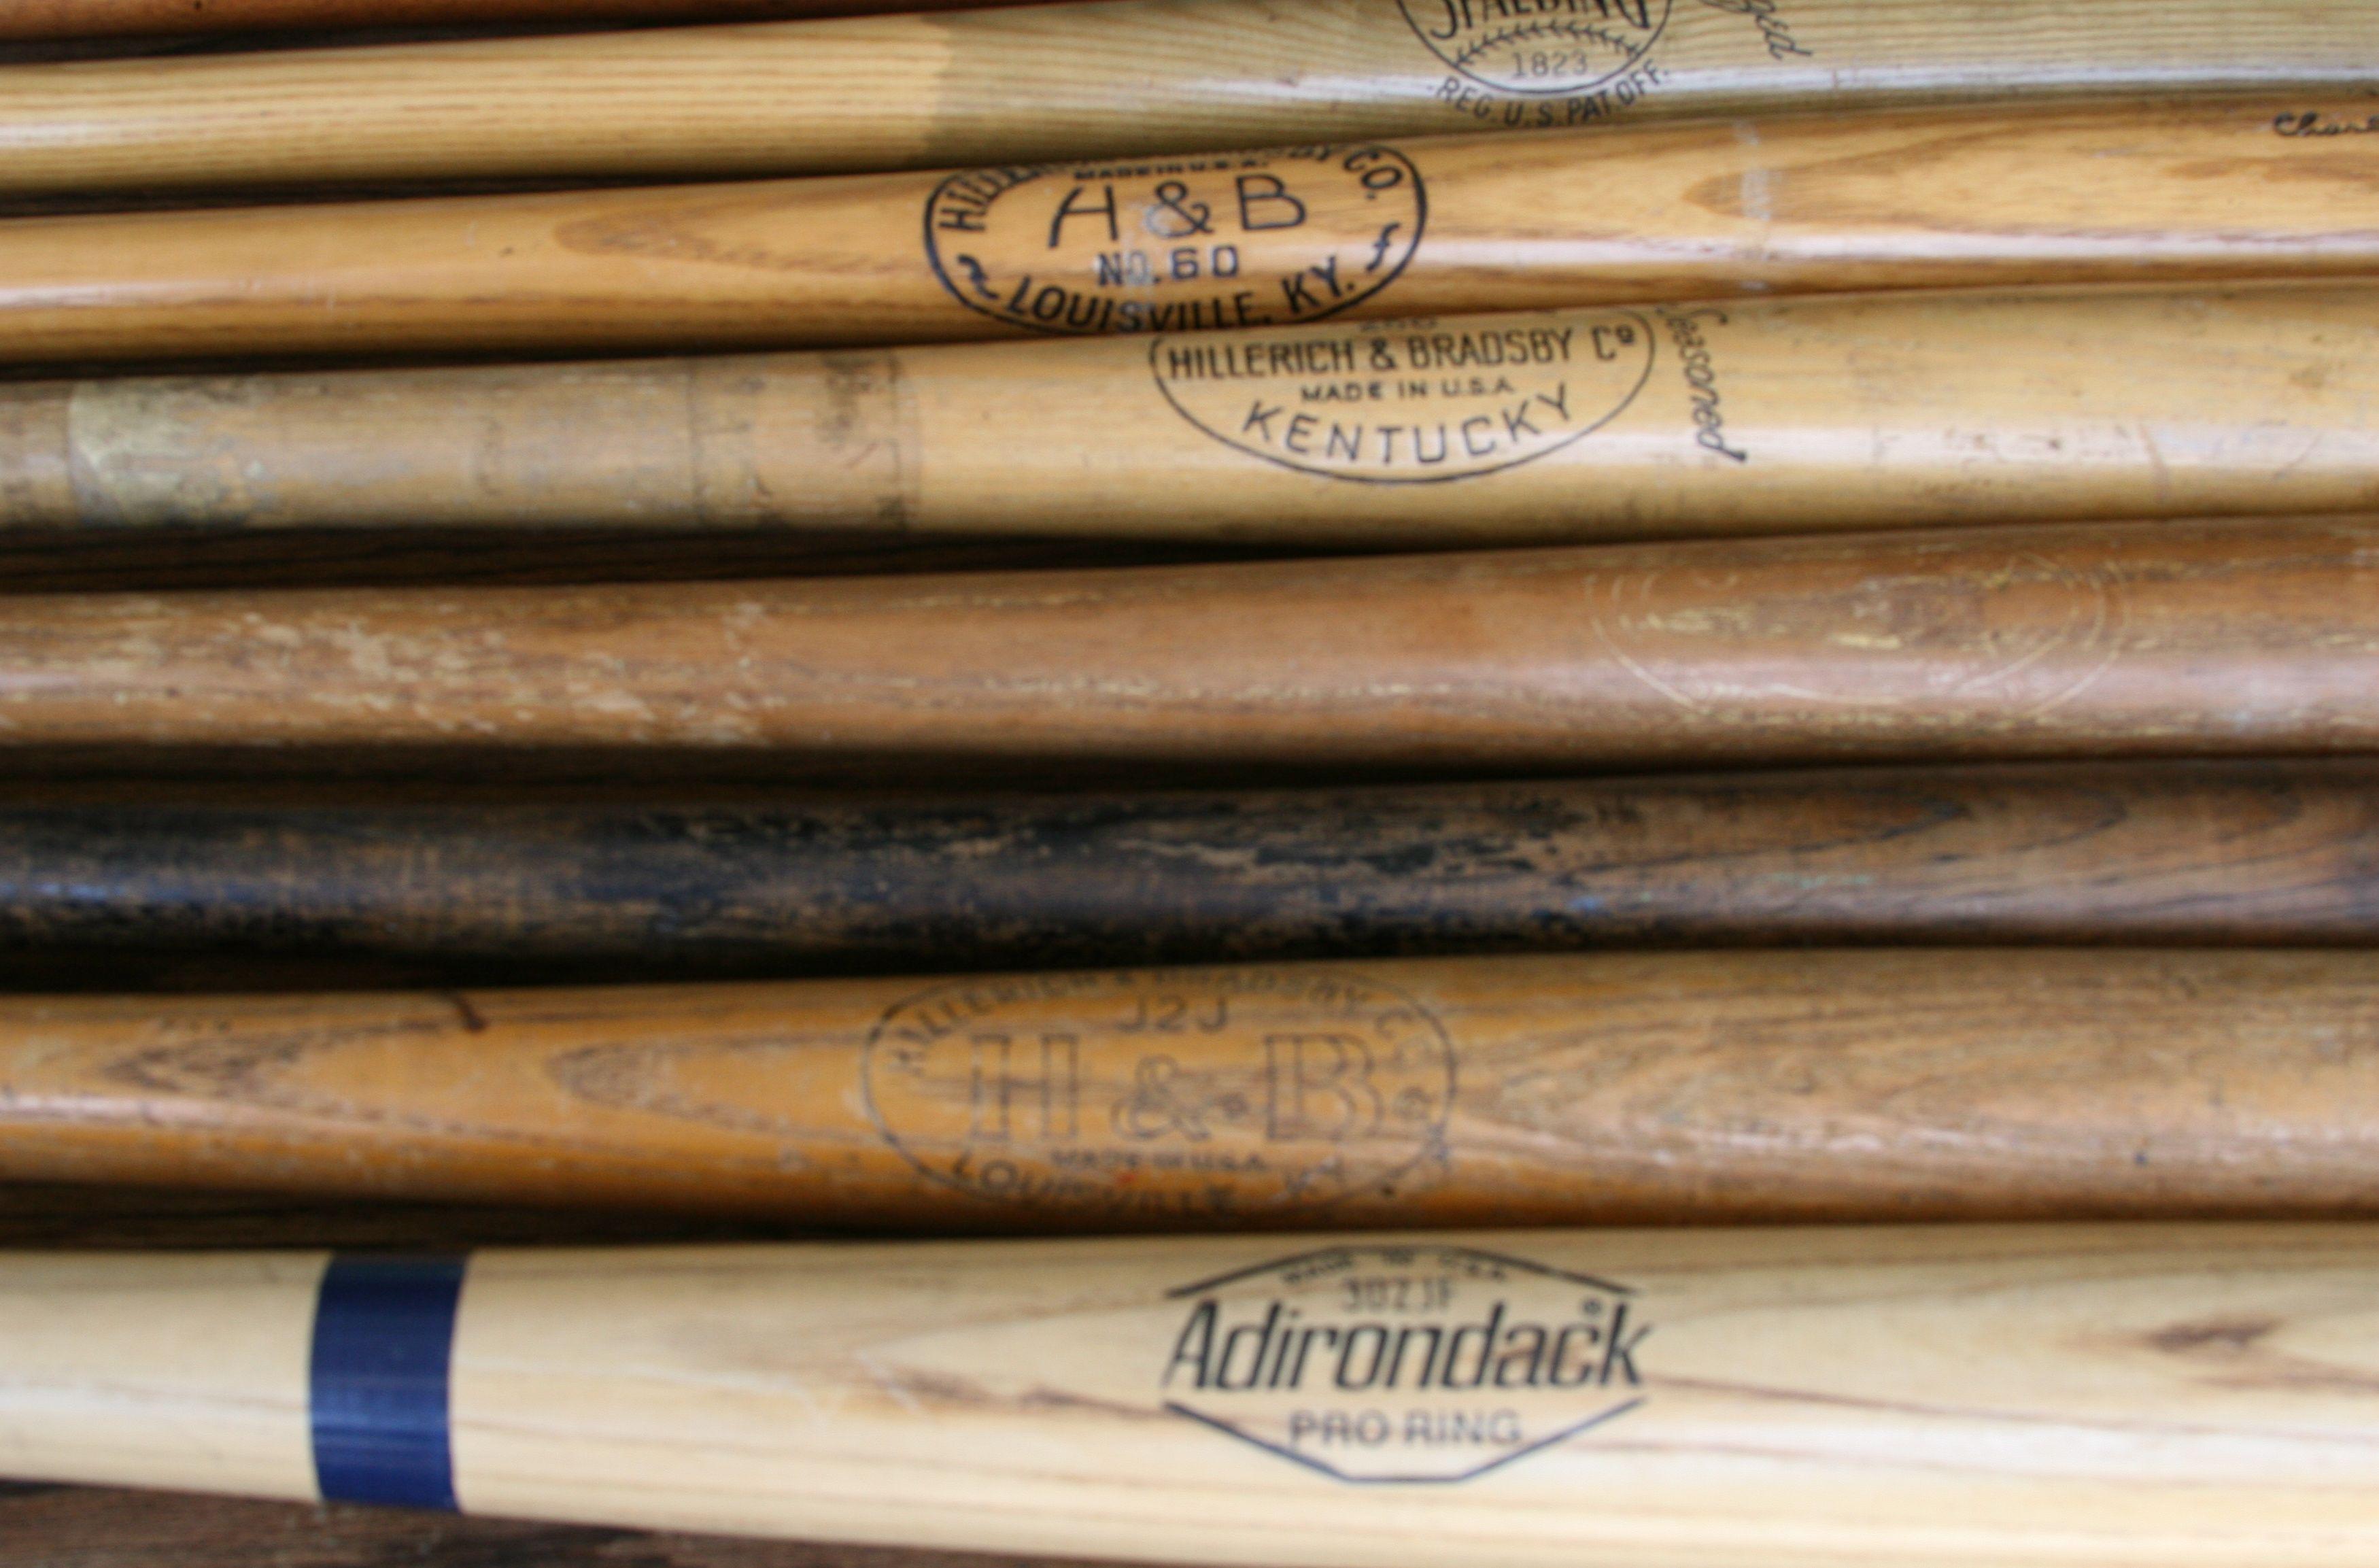 Smithsonian History Of Baseball Bat